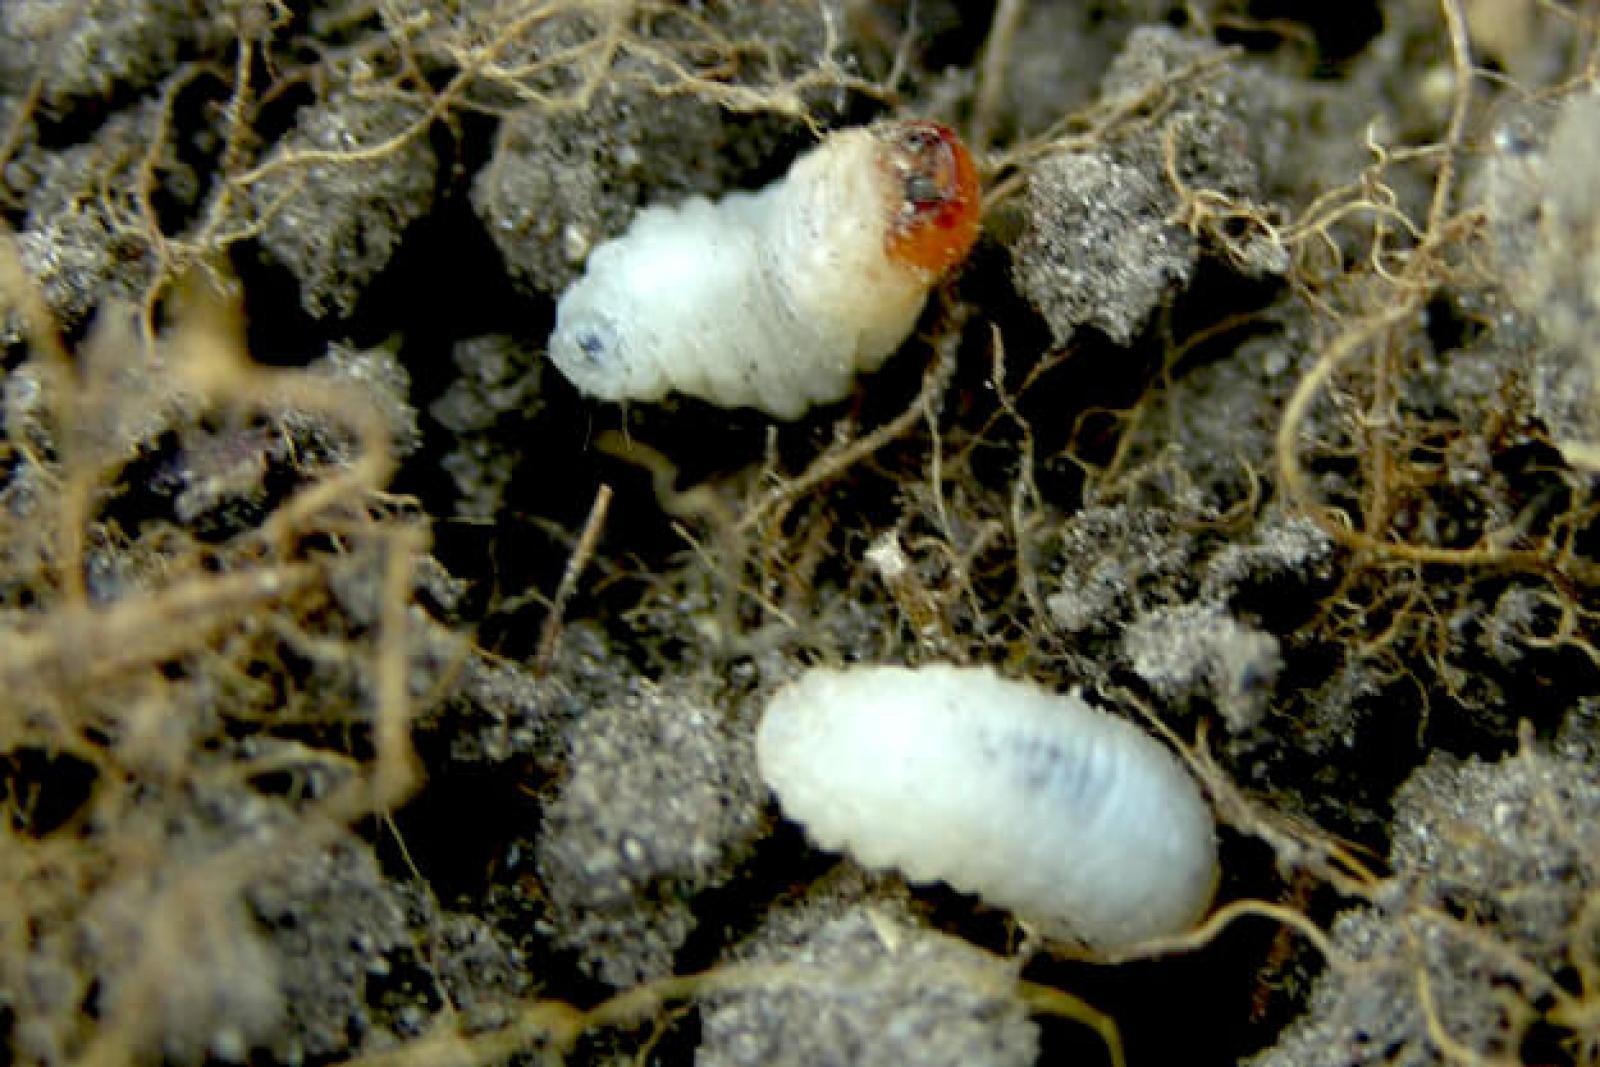 Bluegrass billbug larvae.